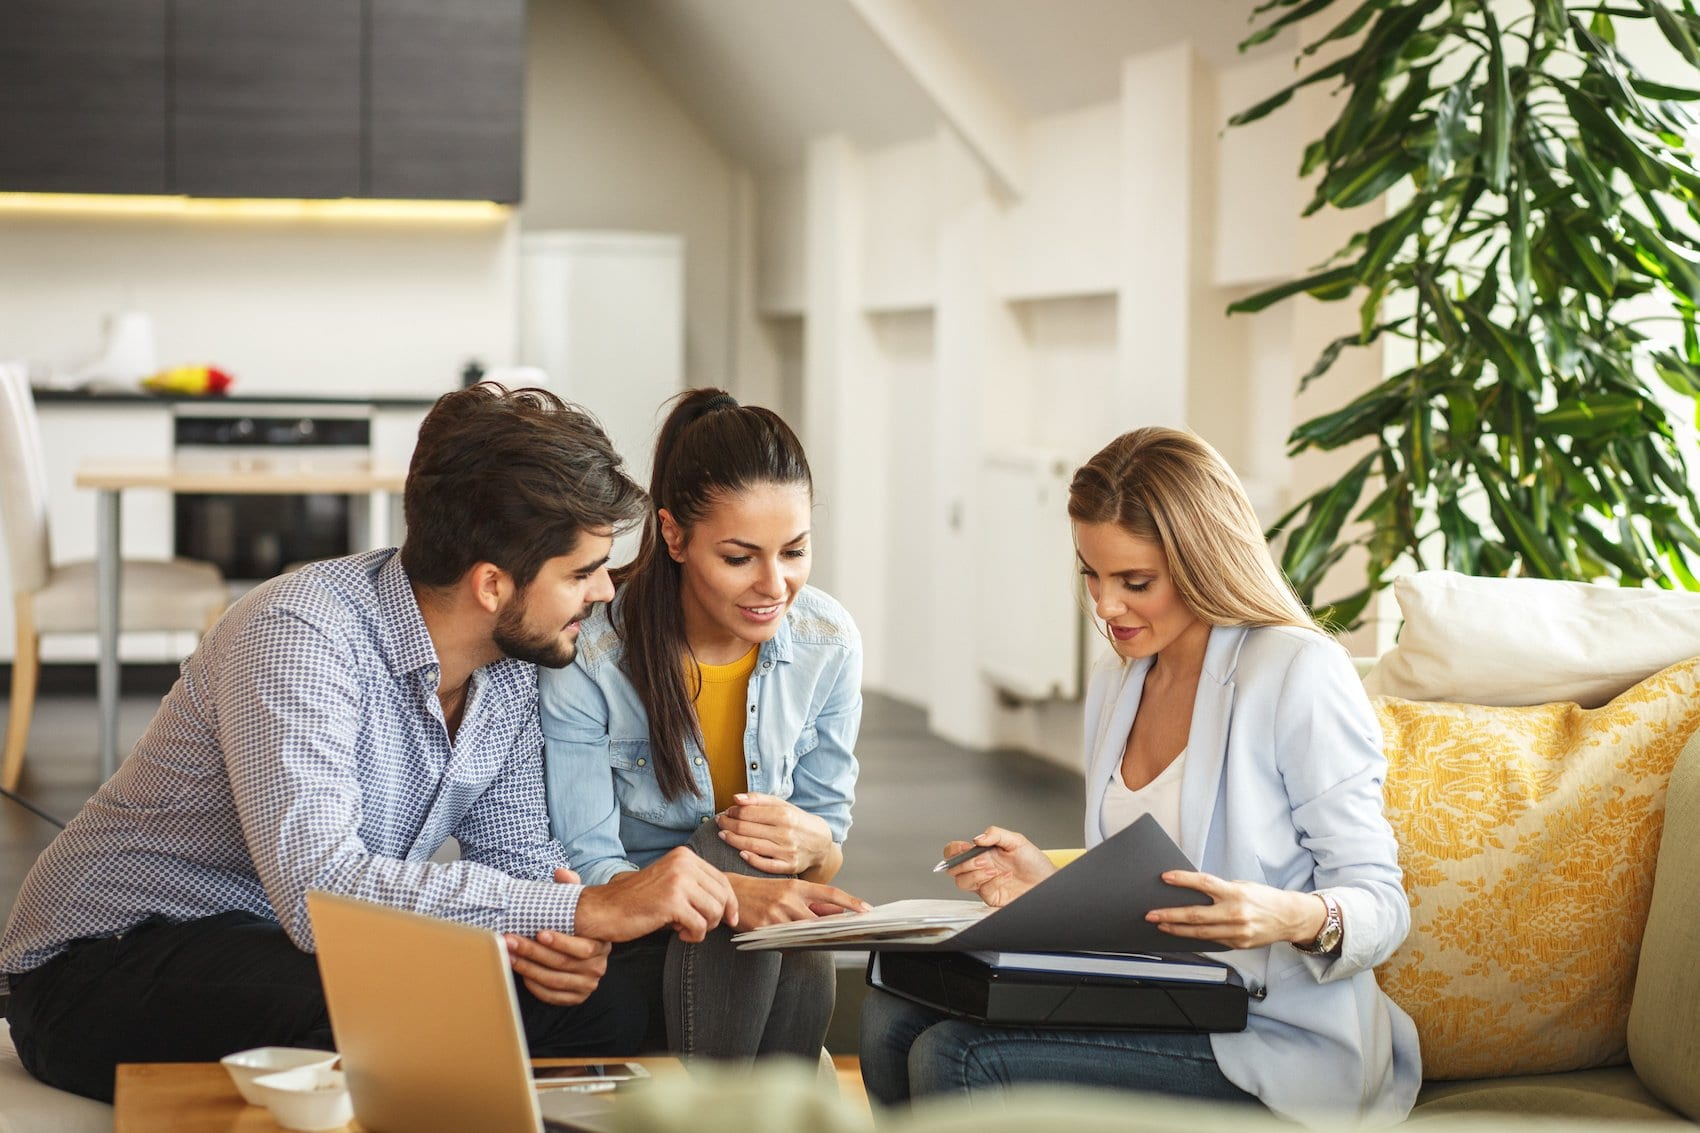 real estate mortgage 2018 homeowners homebuyers kirschner mountain homes kelowna